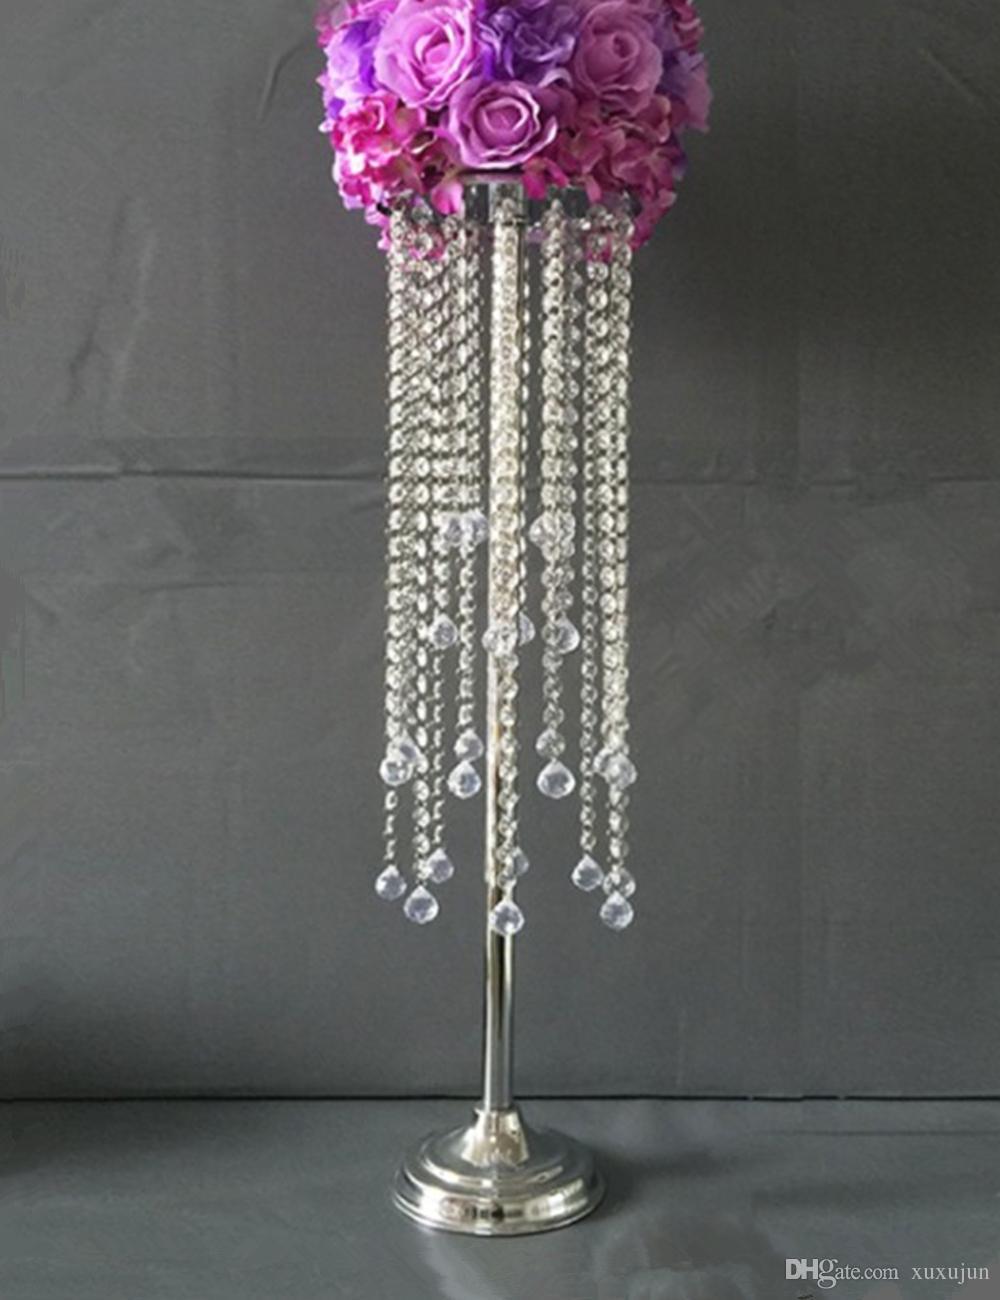 Acrylic Crystal Wedding Centerpiece Table 80CM Tall 20CM Diameter Decor Road Leads